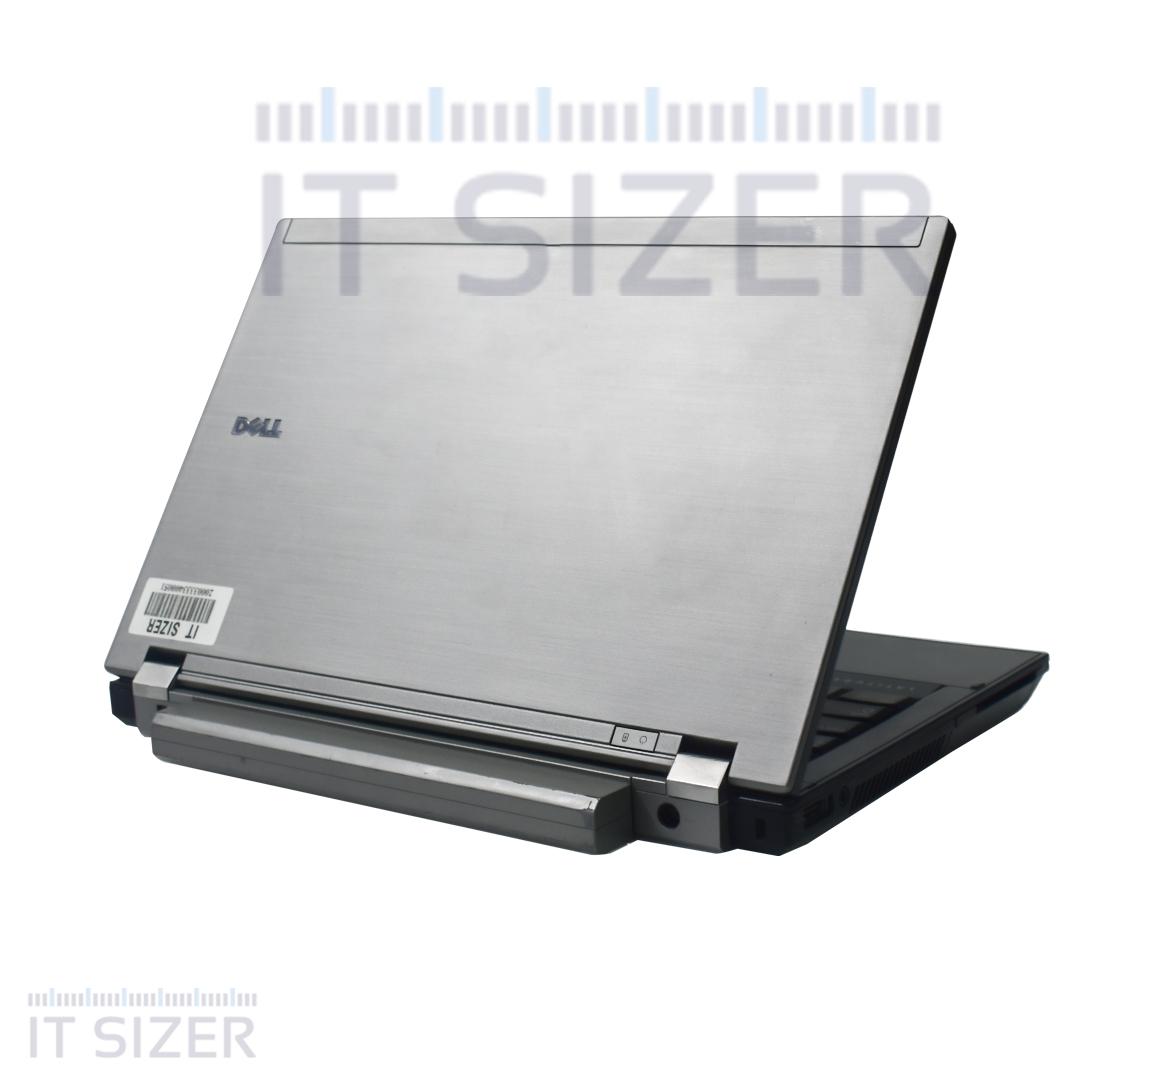 Dell Latitude E4310 Business Laptop, Intel Core i5-M540 CPU, 8GB DDR3 SODIMM RAM, 500GB SATA 2.5 Hard, 13 inch Display, Windows 10 Pro (Renewed)